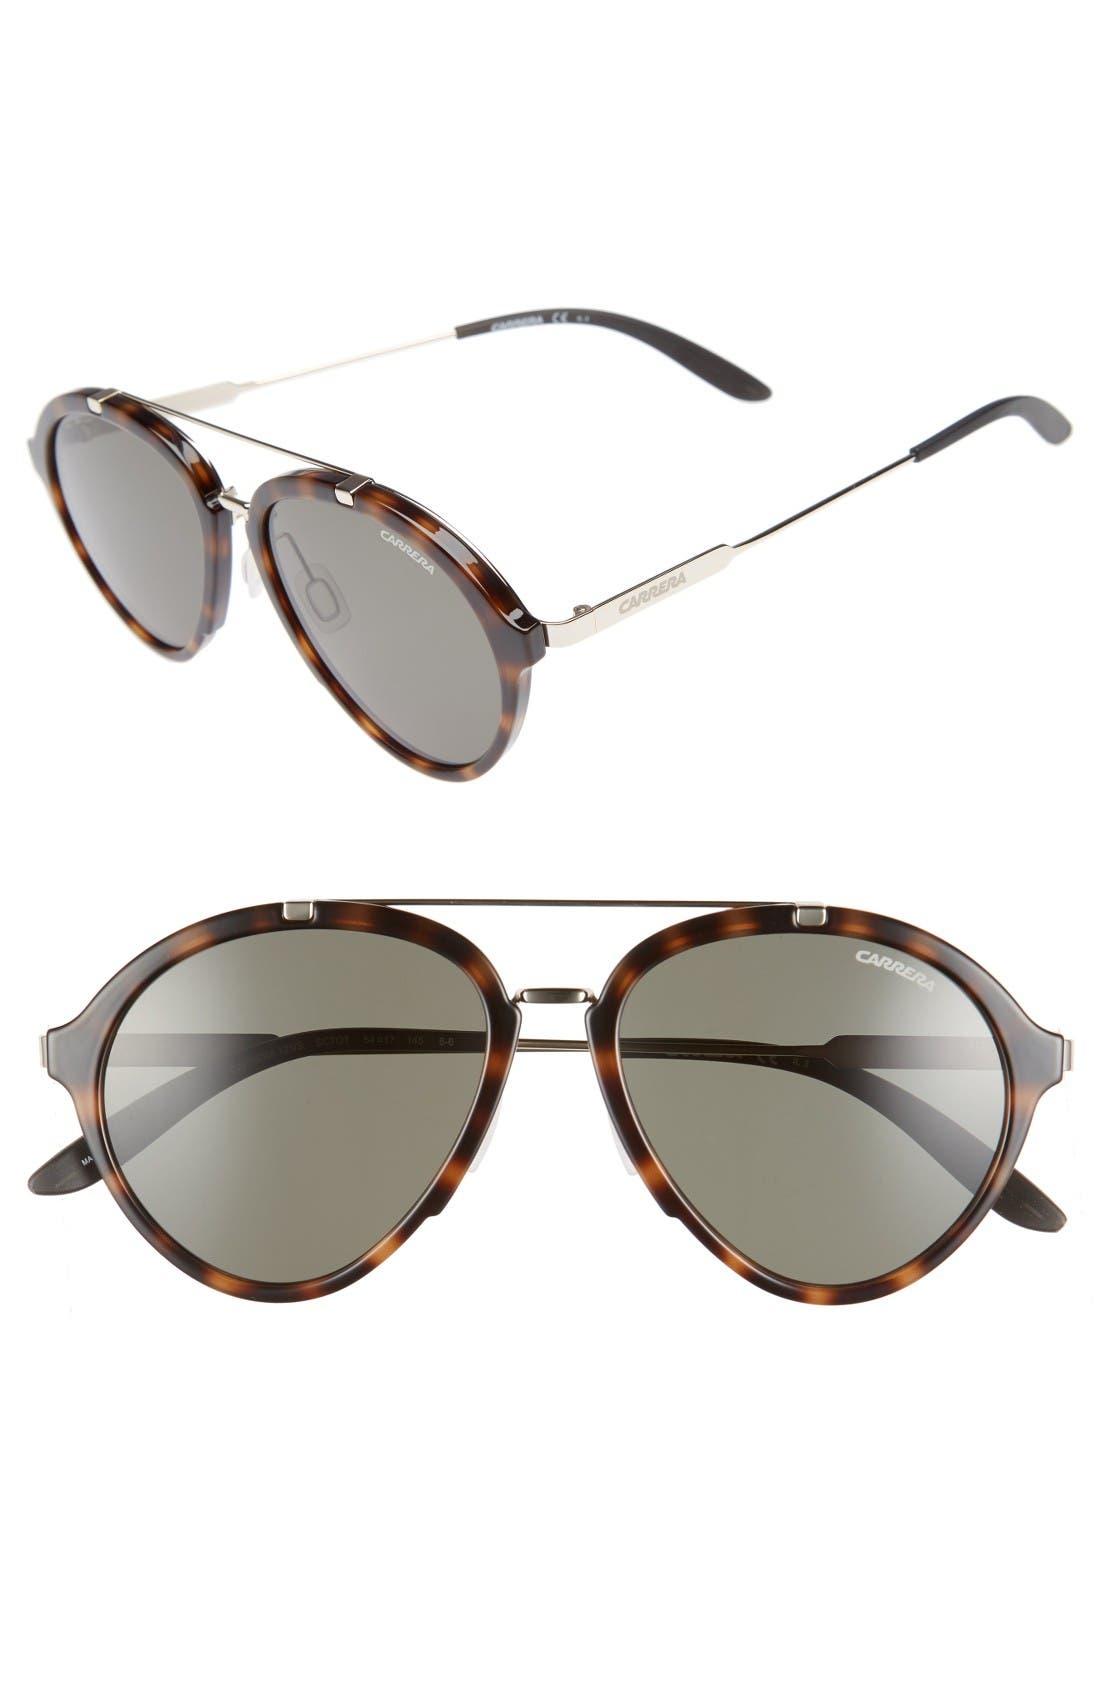 Main Image - Carrera Eyewear 54mm Aviator Sunglasses